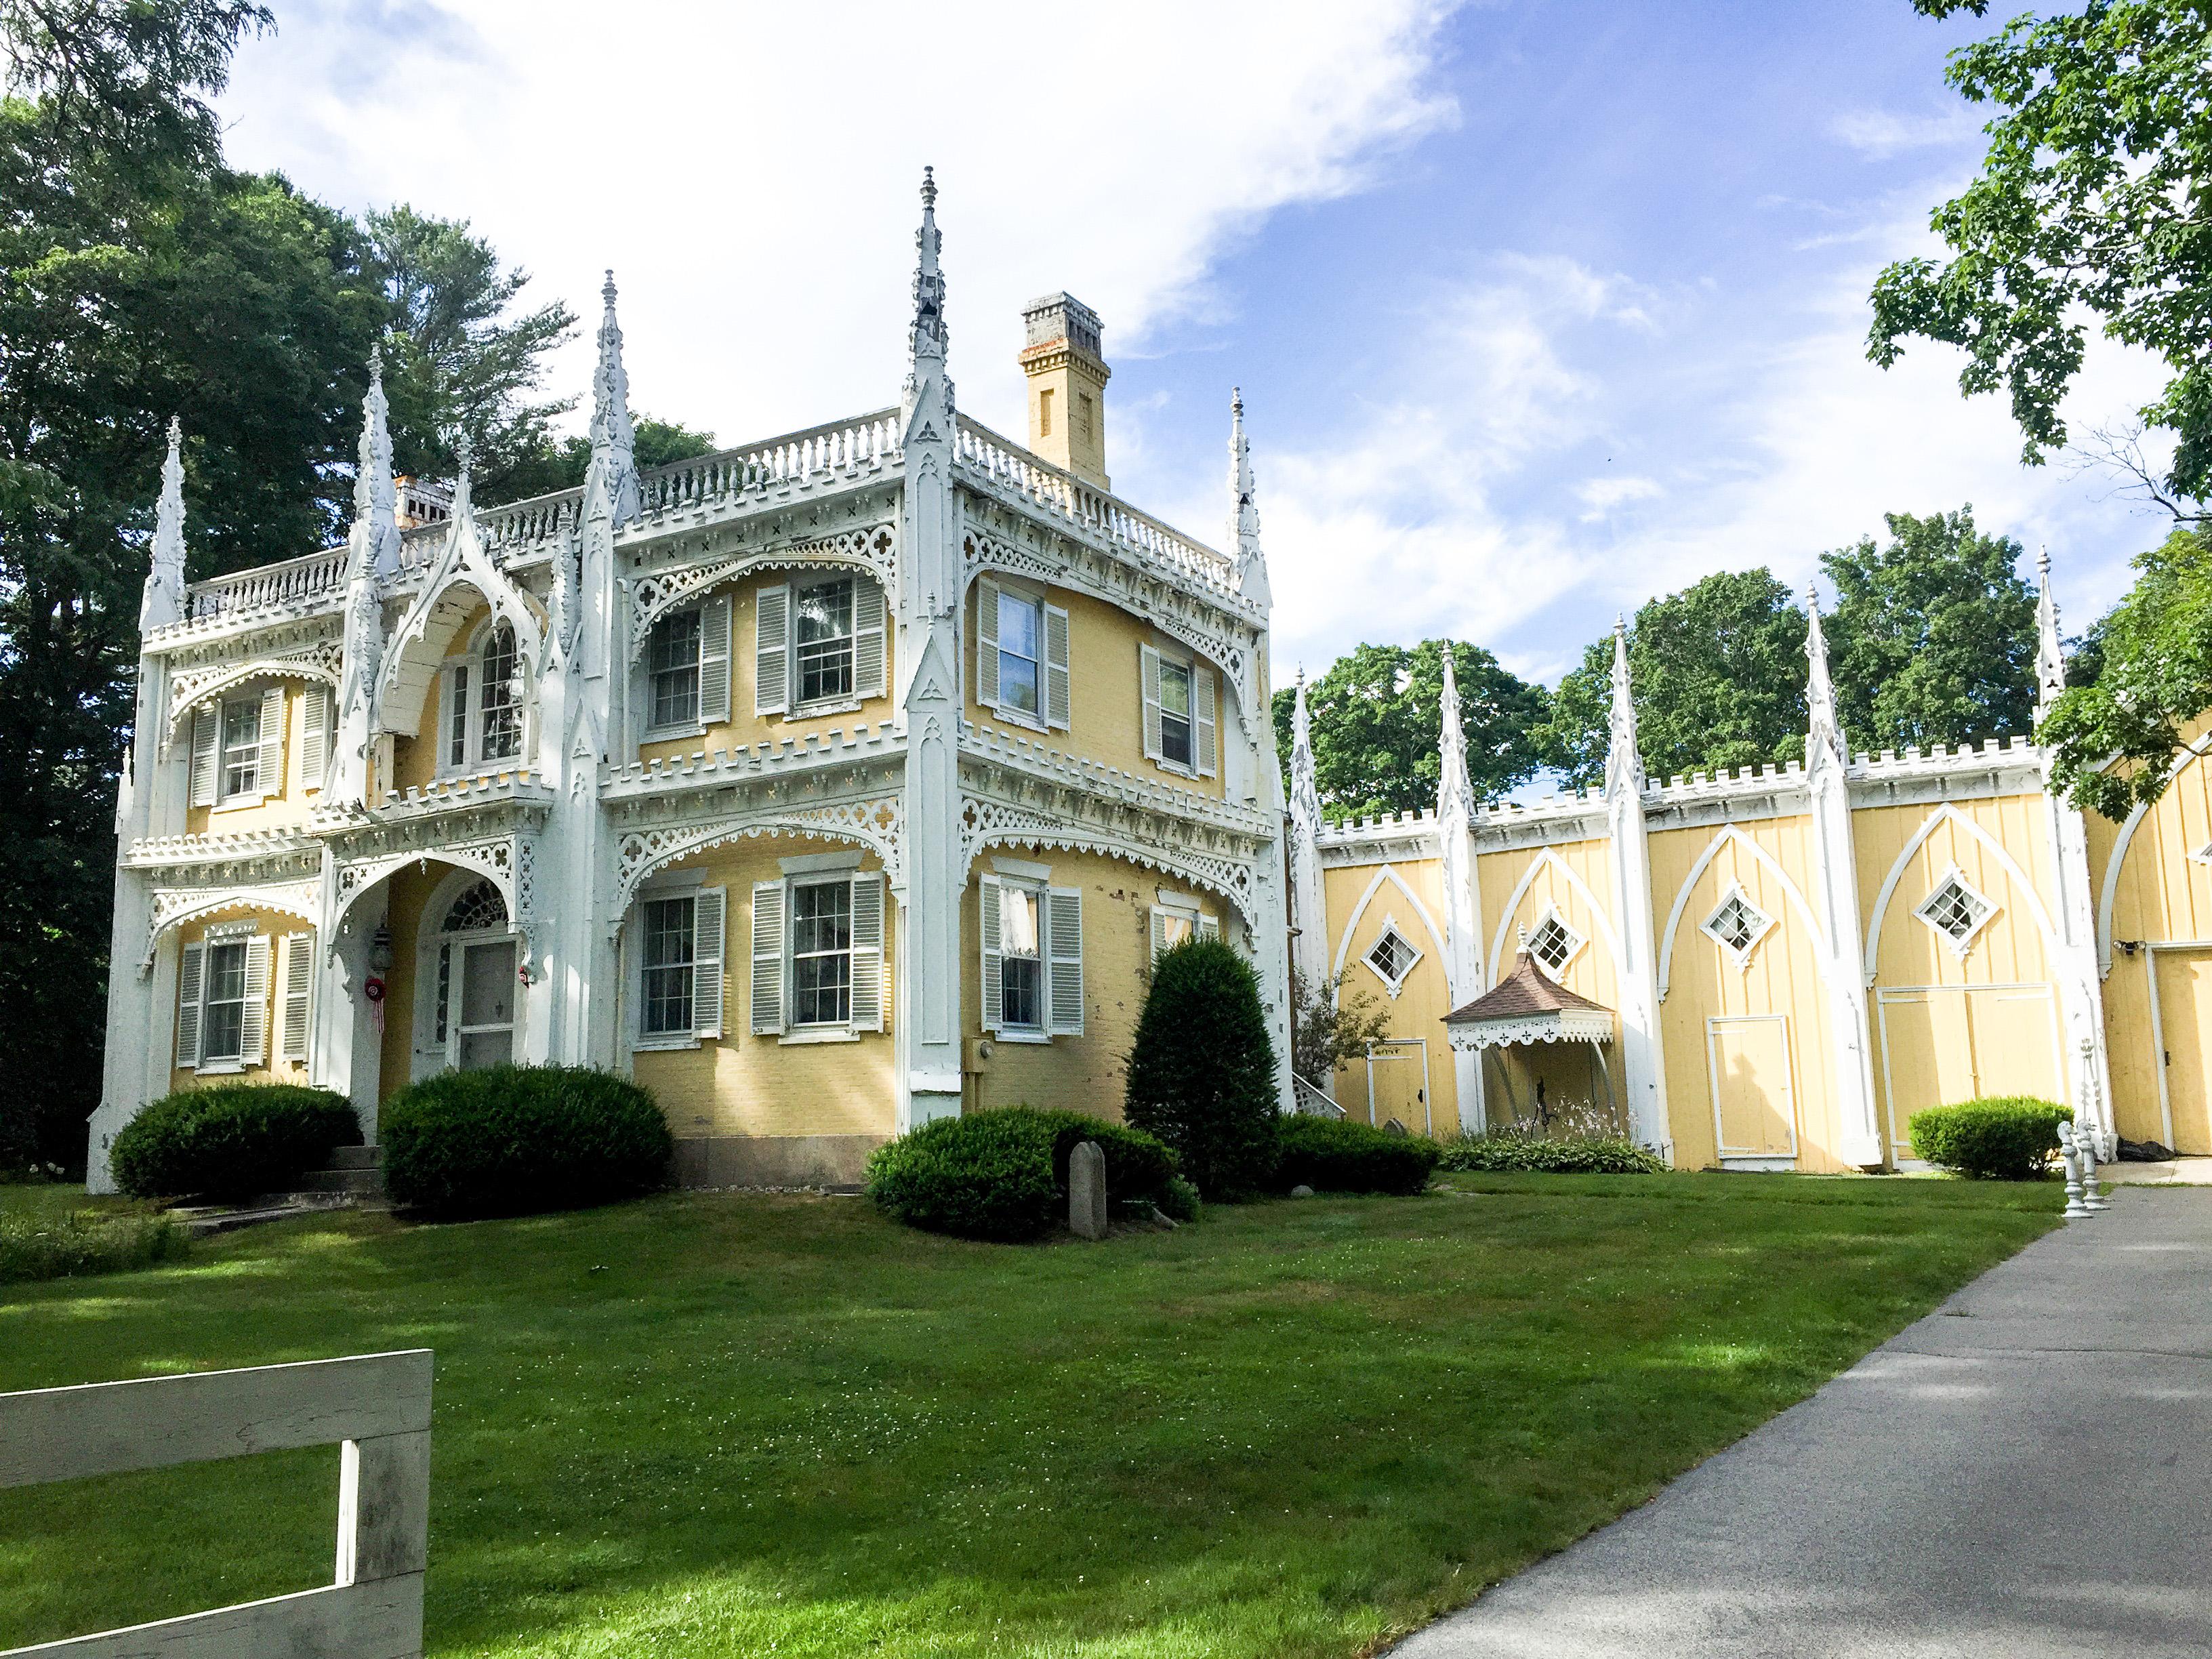 The Wedding Cake House, MAINE